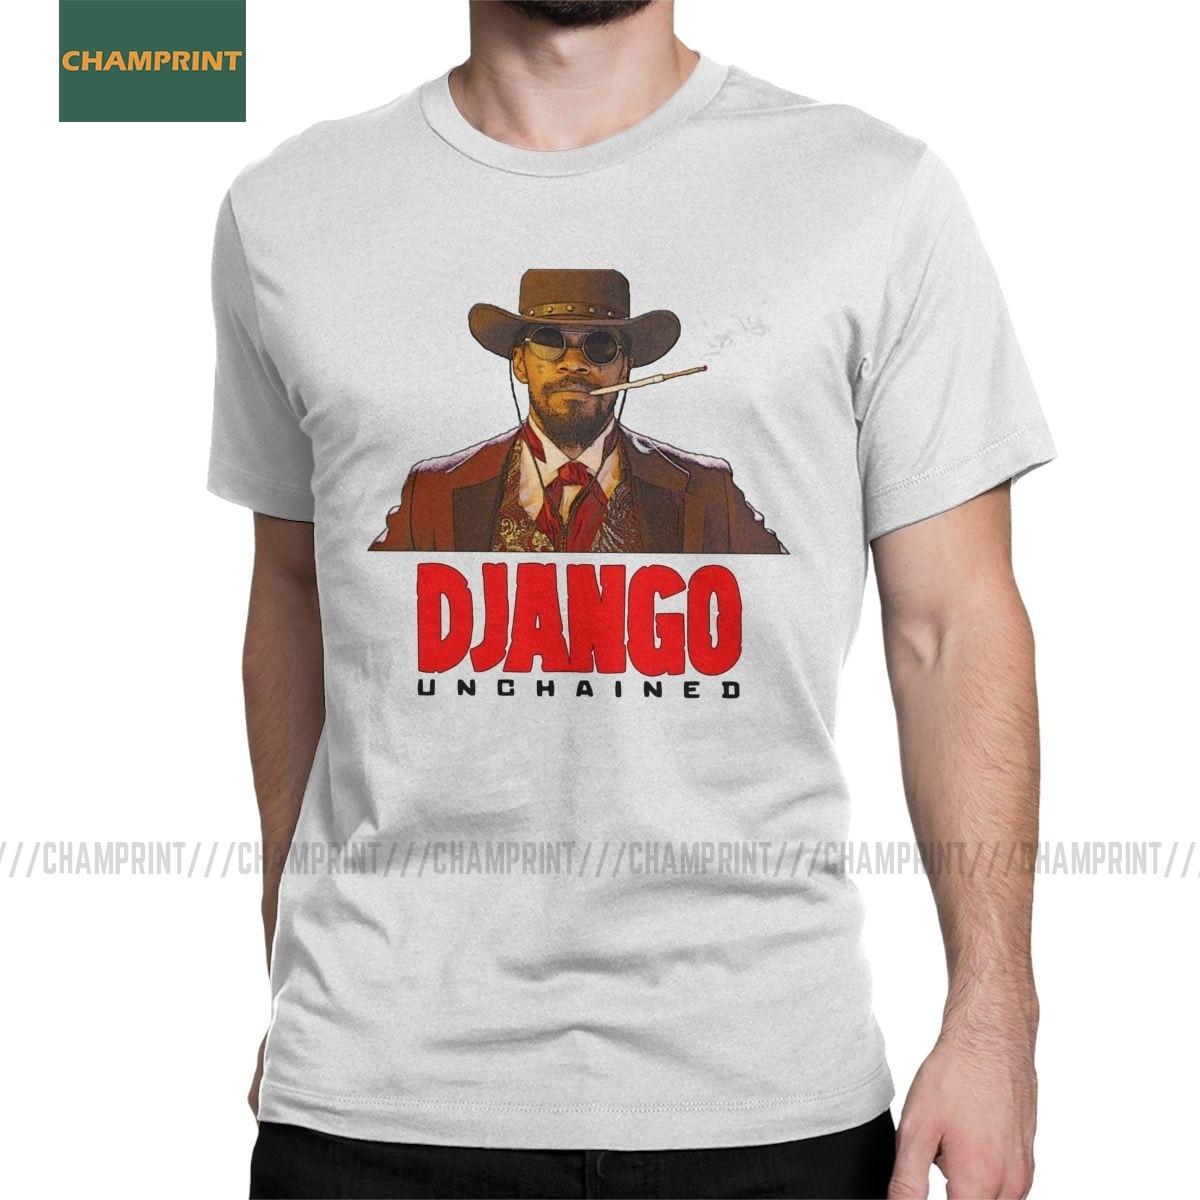 Impresionante camiseta de Django desencadenado, camisetas de algodón para hombre, Quentin Tarantino, película occidental, Leonardo, camisetas de manga corta para dentista vaquero